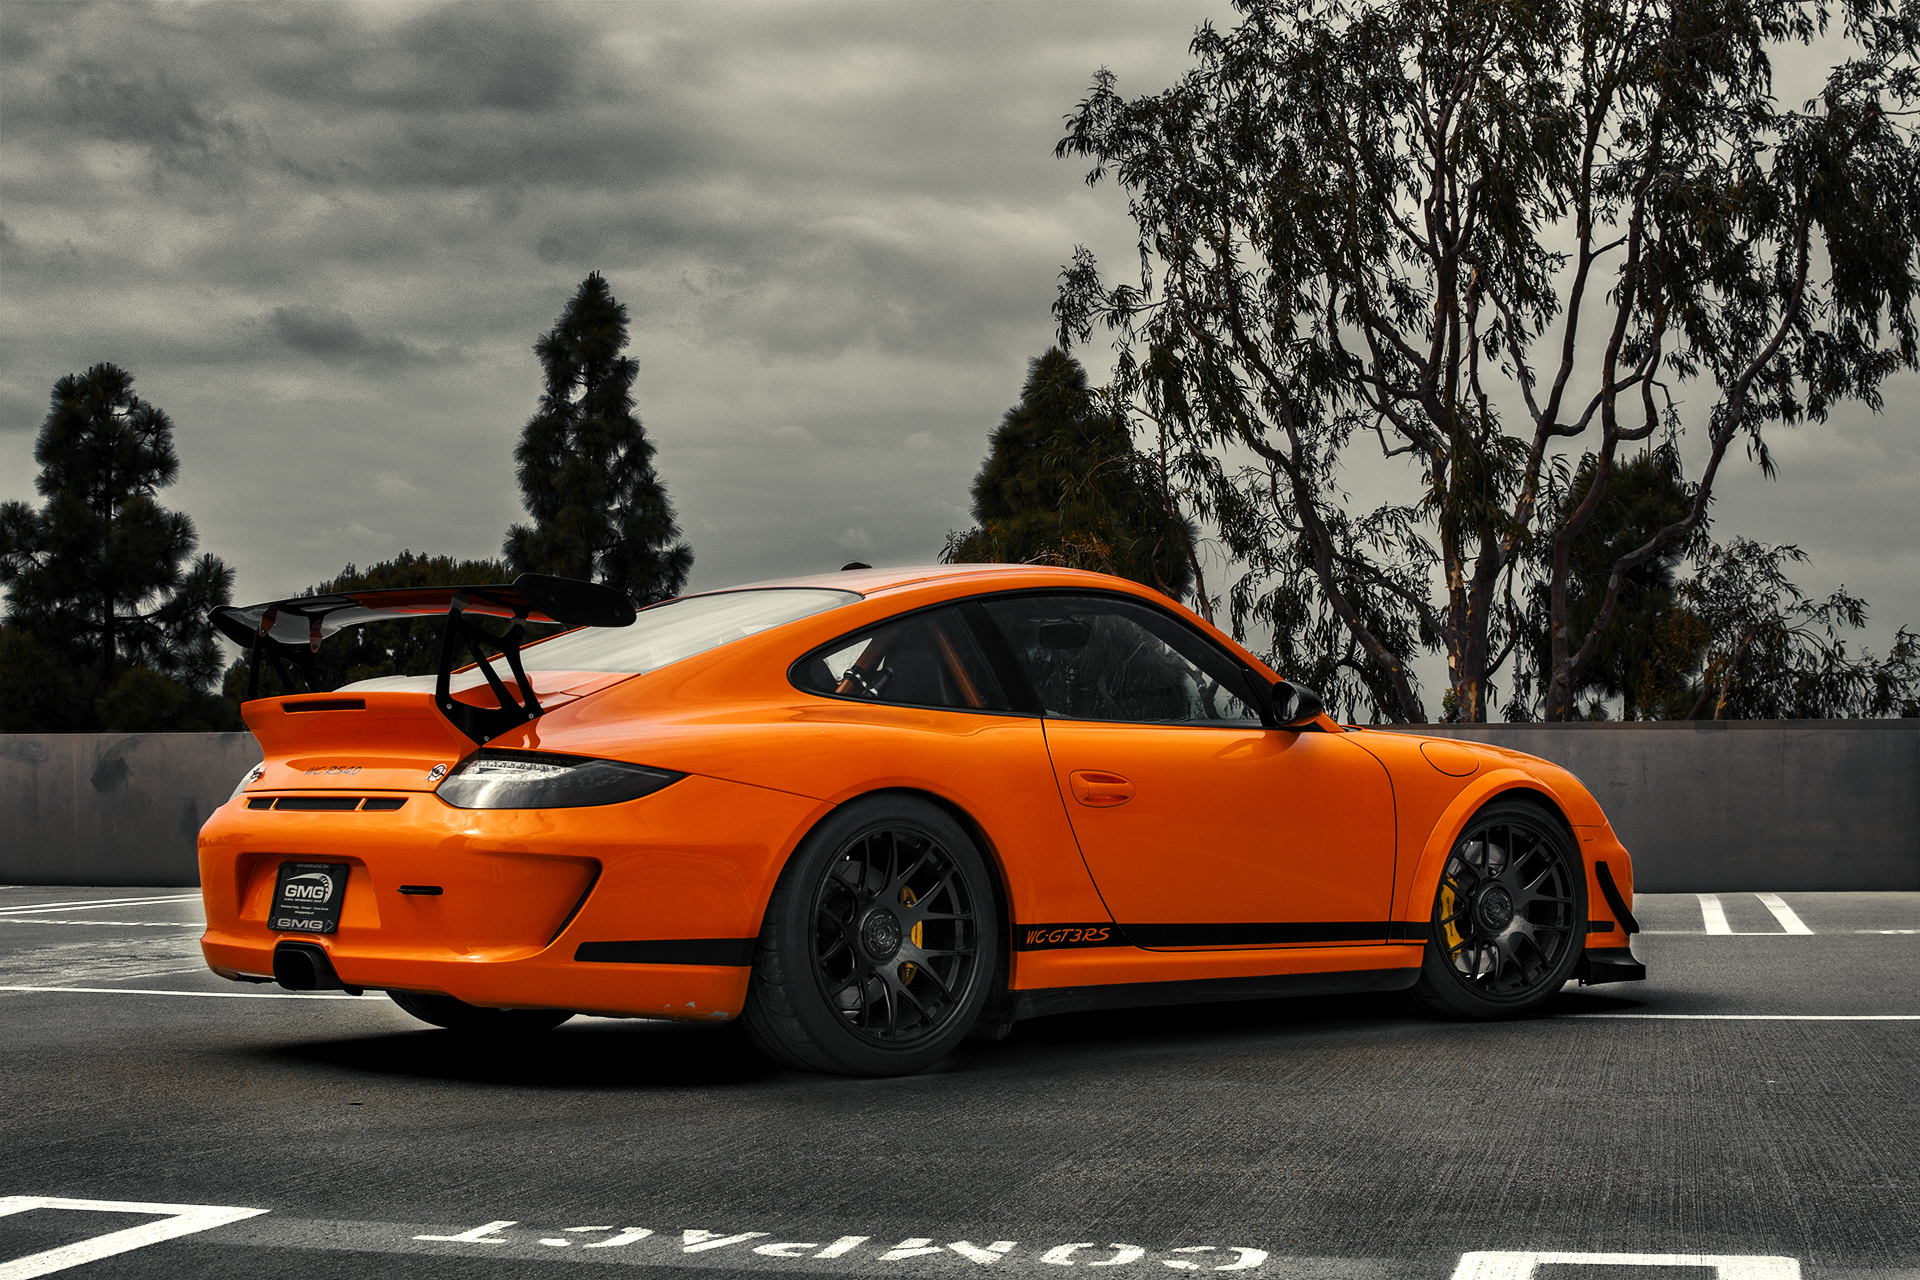 orange porsche 911 gt3 rs by gmg racing gtspirit. Black Bedroom Furniture Sets. Home Design Ideas